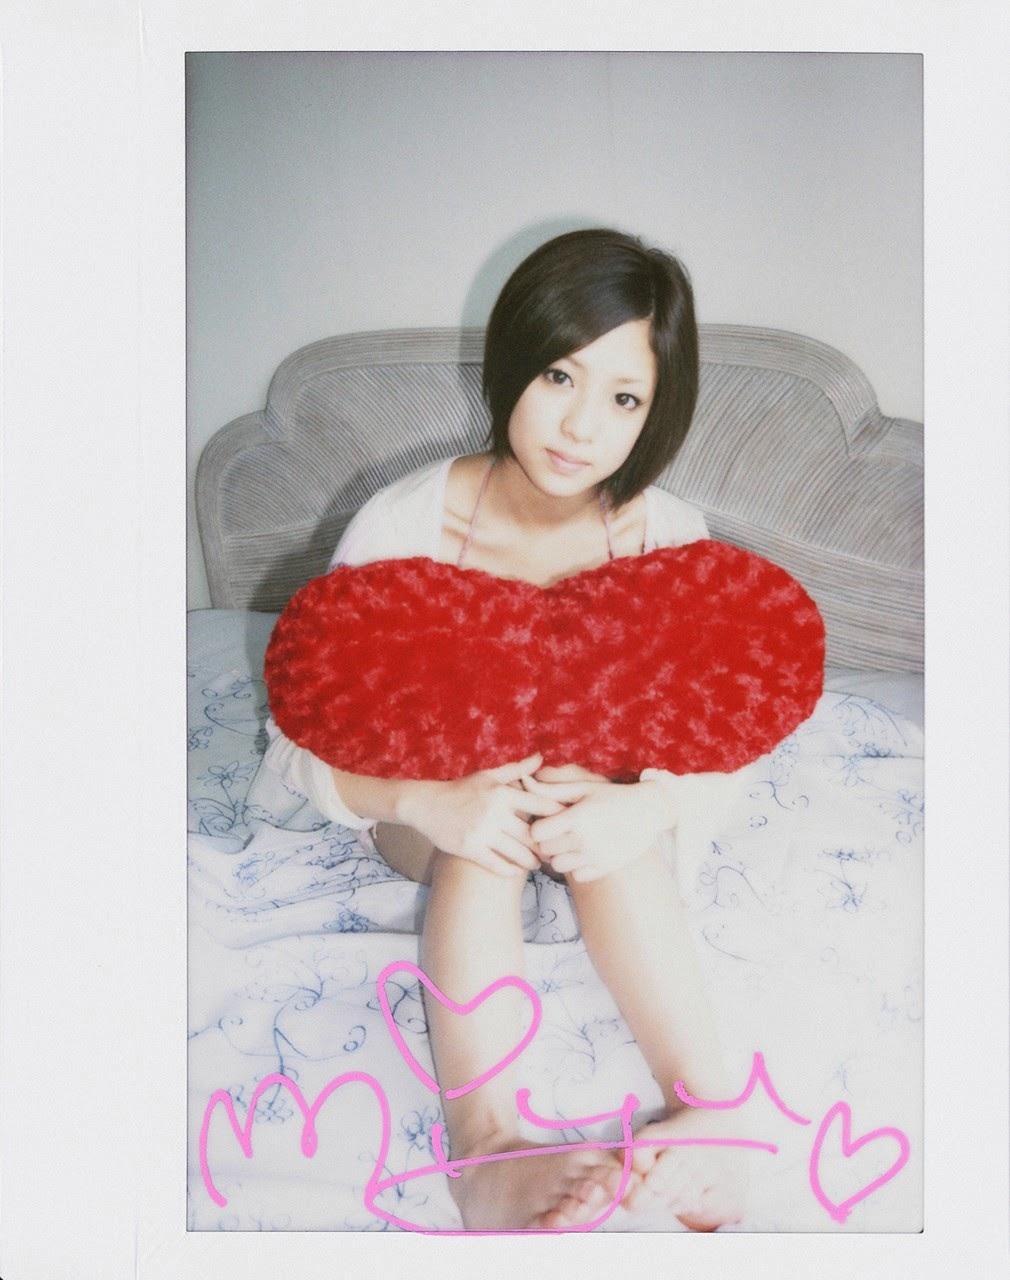 Miracle beautiful high school girl worthy of the name fairy ultimate beautiful girl002